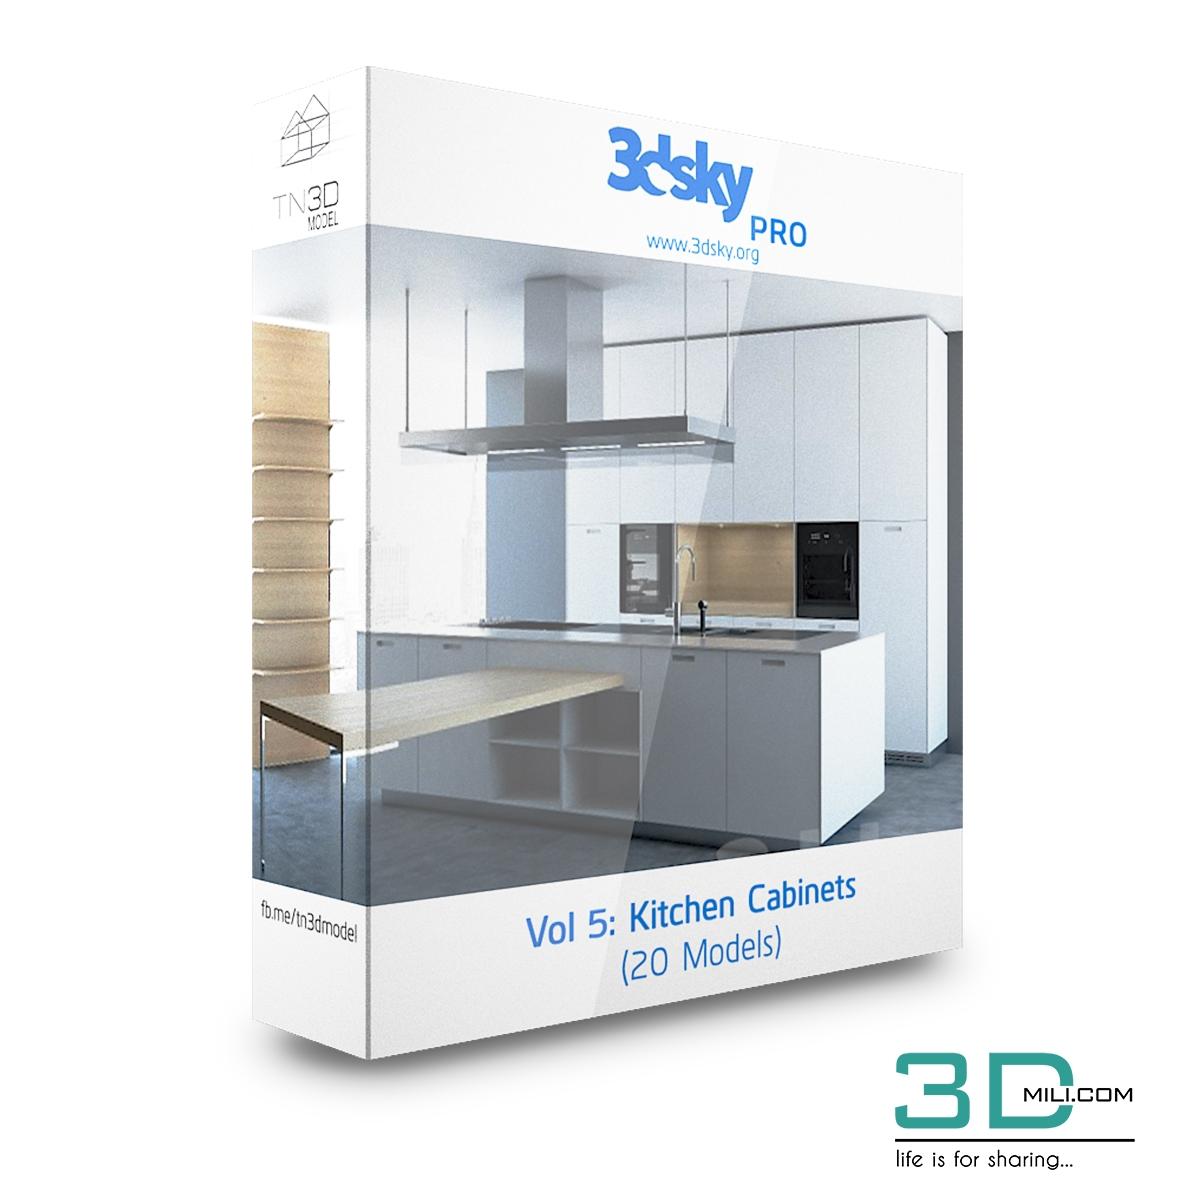 3dsky Pro Vol 5: Kitchen Cabinets - 3D Mili - Download 3D